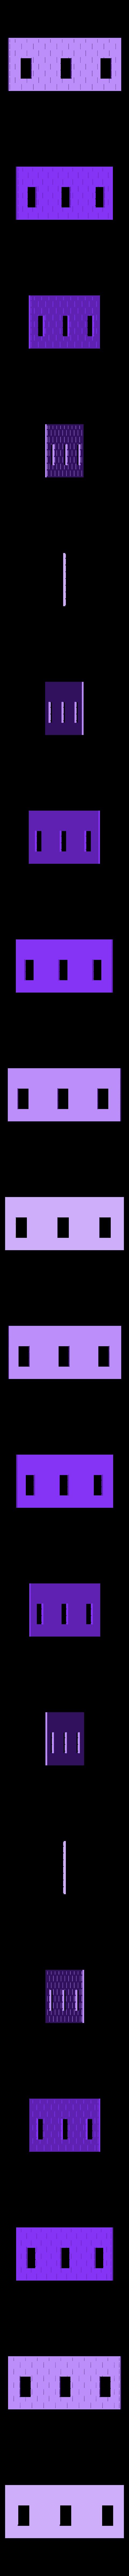 H2+MI.stl Download STL file Brick house • 3D printer template, Fira